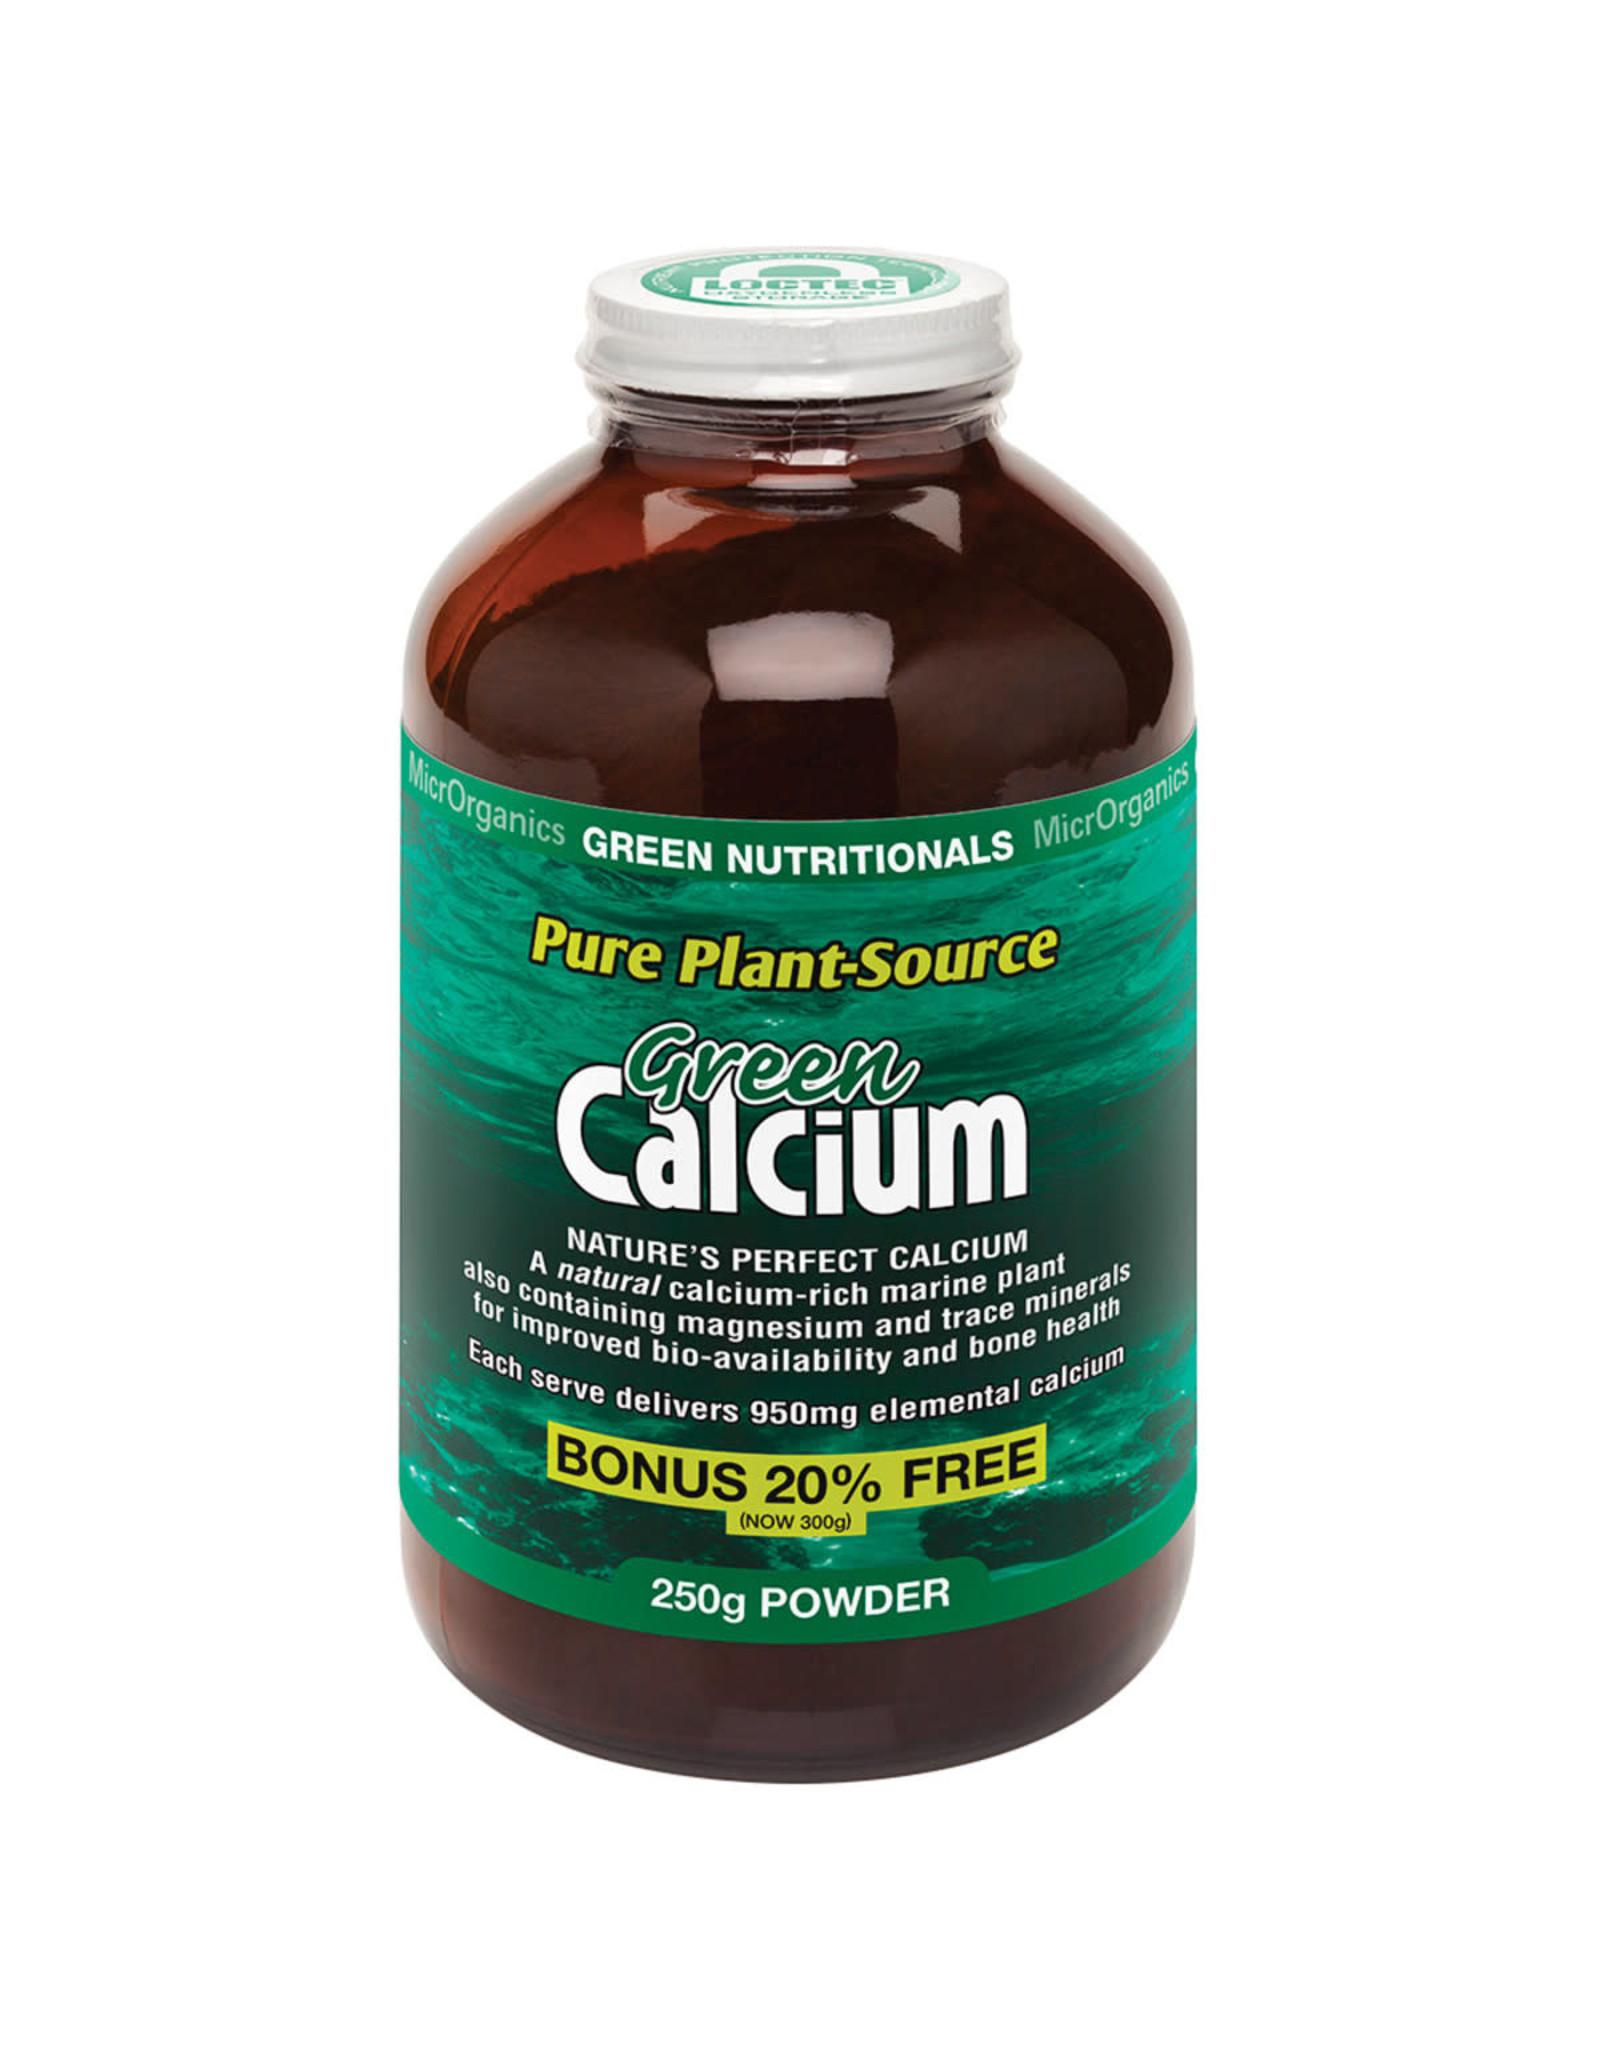 MicroOrganics Green Nutritionals Green Calcium (Pure Plant-Source) 250g